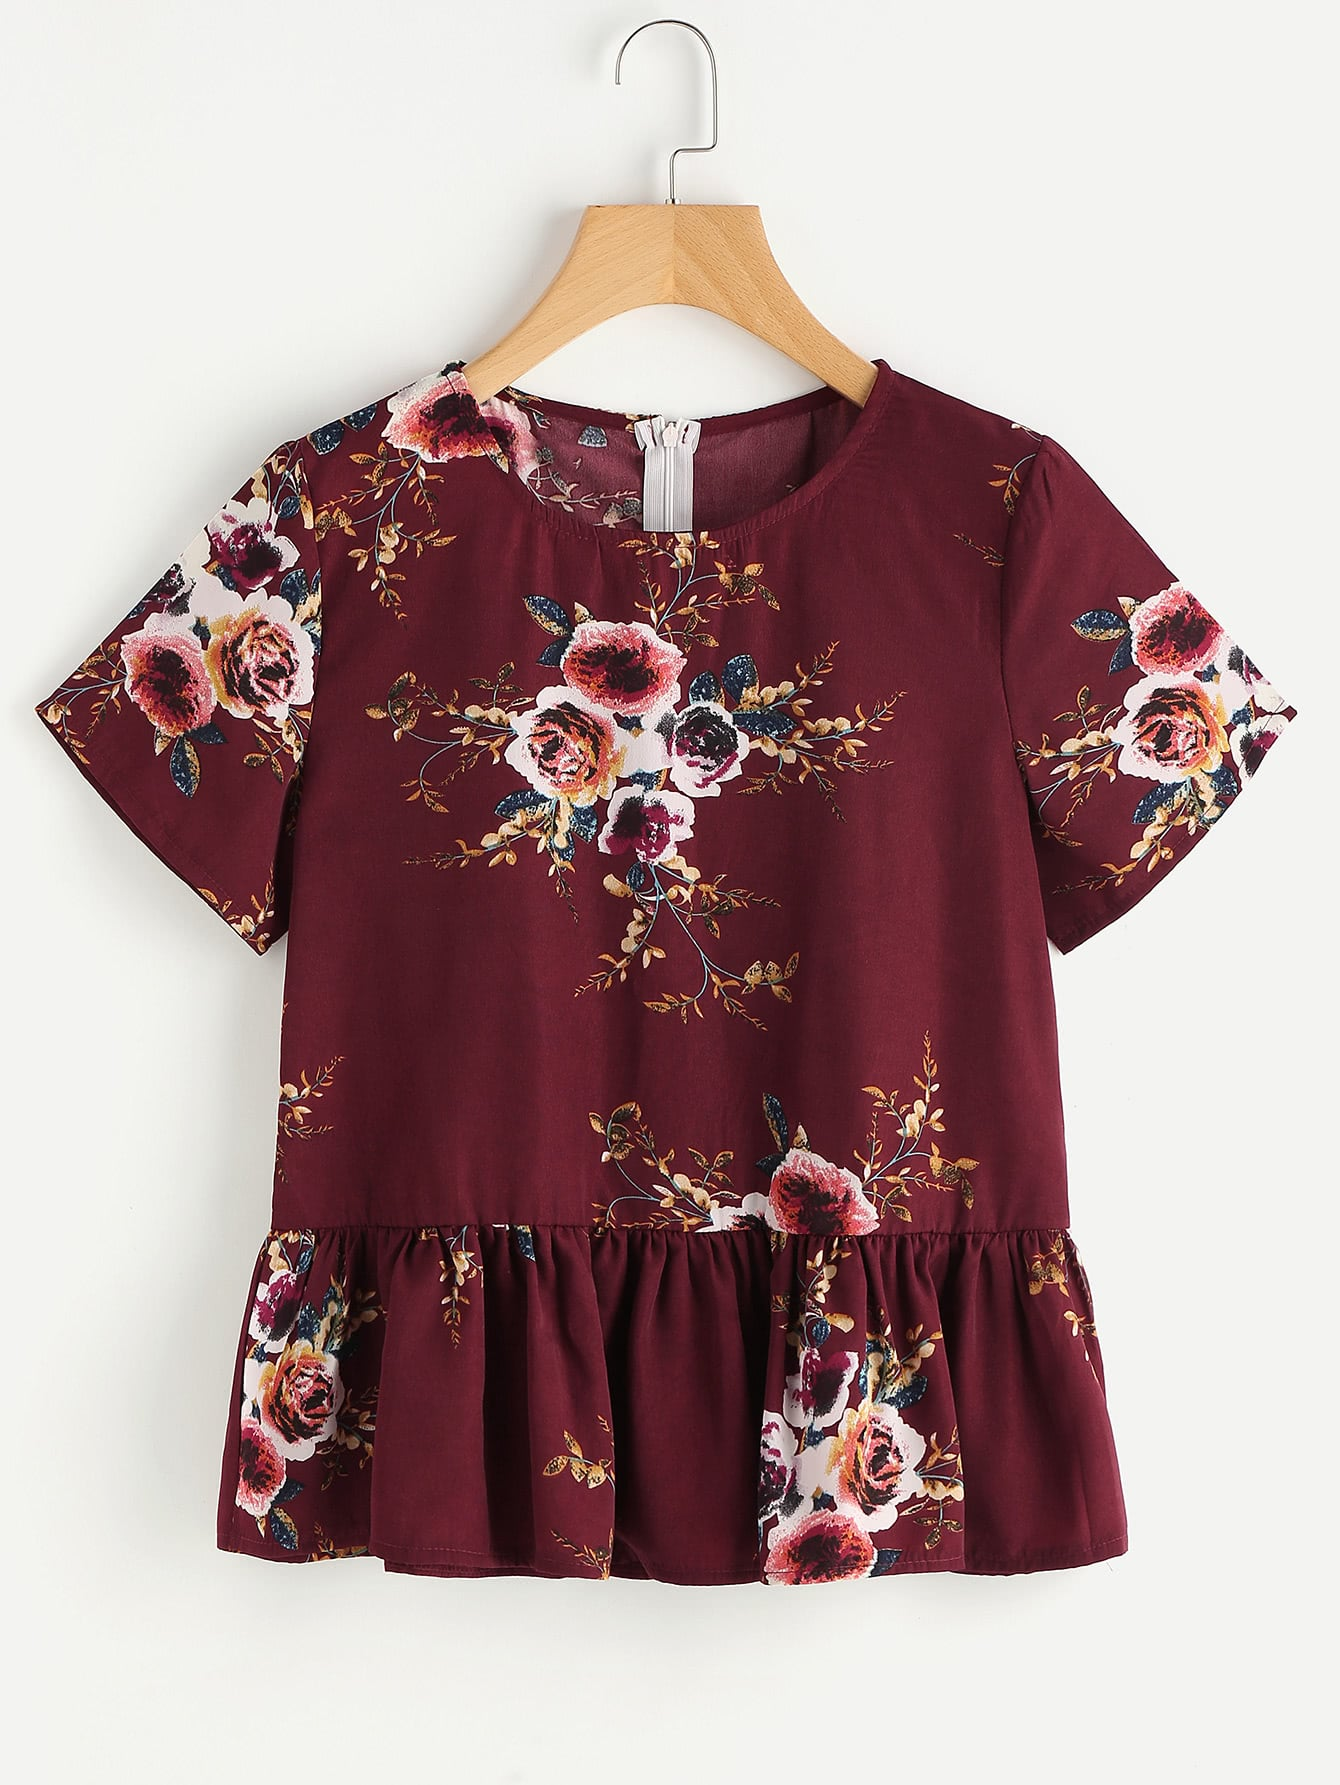 Floral Print Random Frill Hem Blouse kids floral embroidery frill blouse